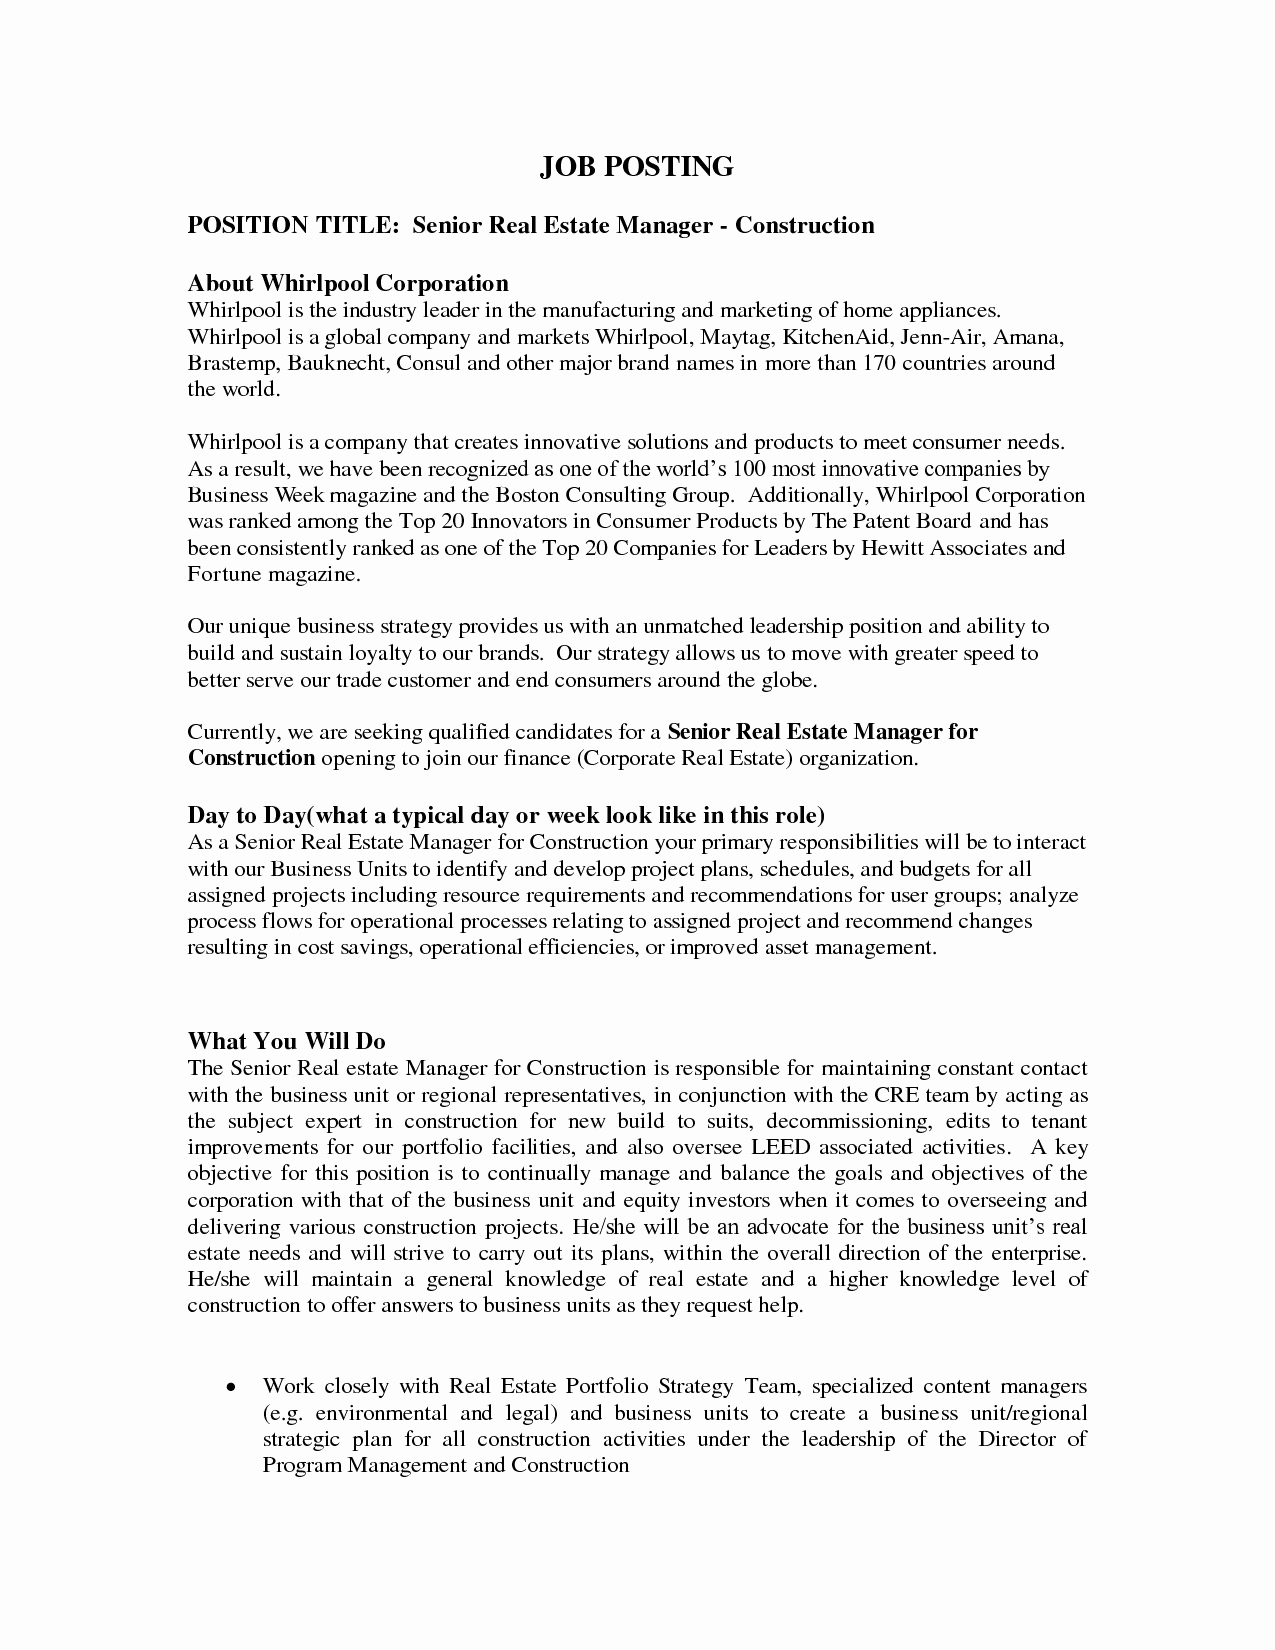 Job Posting Template Word Luxury Best S Of Job Posting Template Internal Job Posting